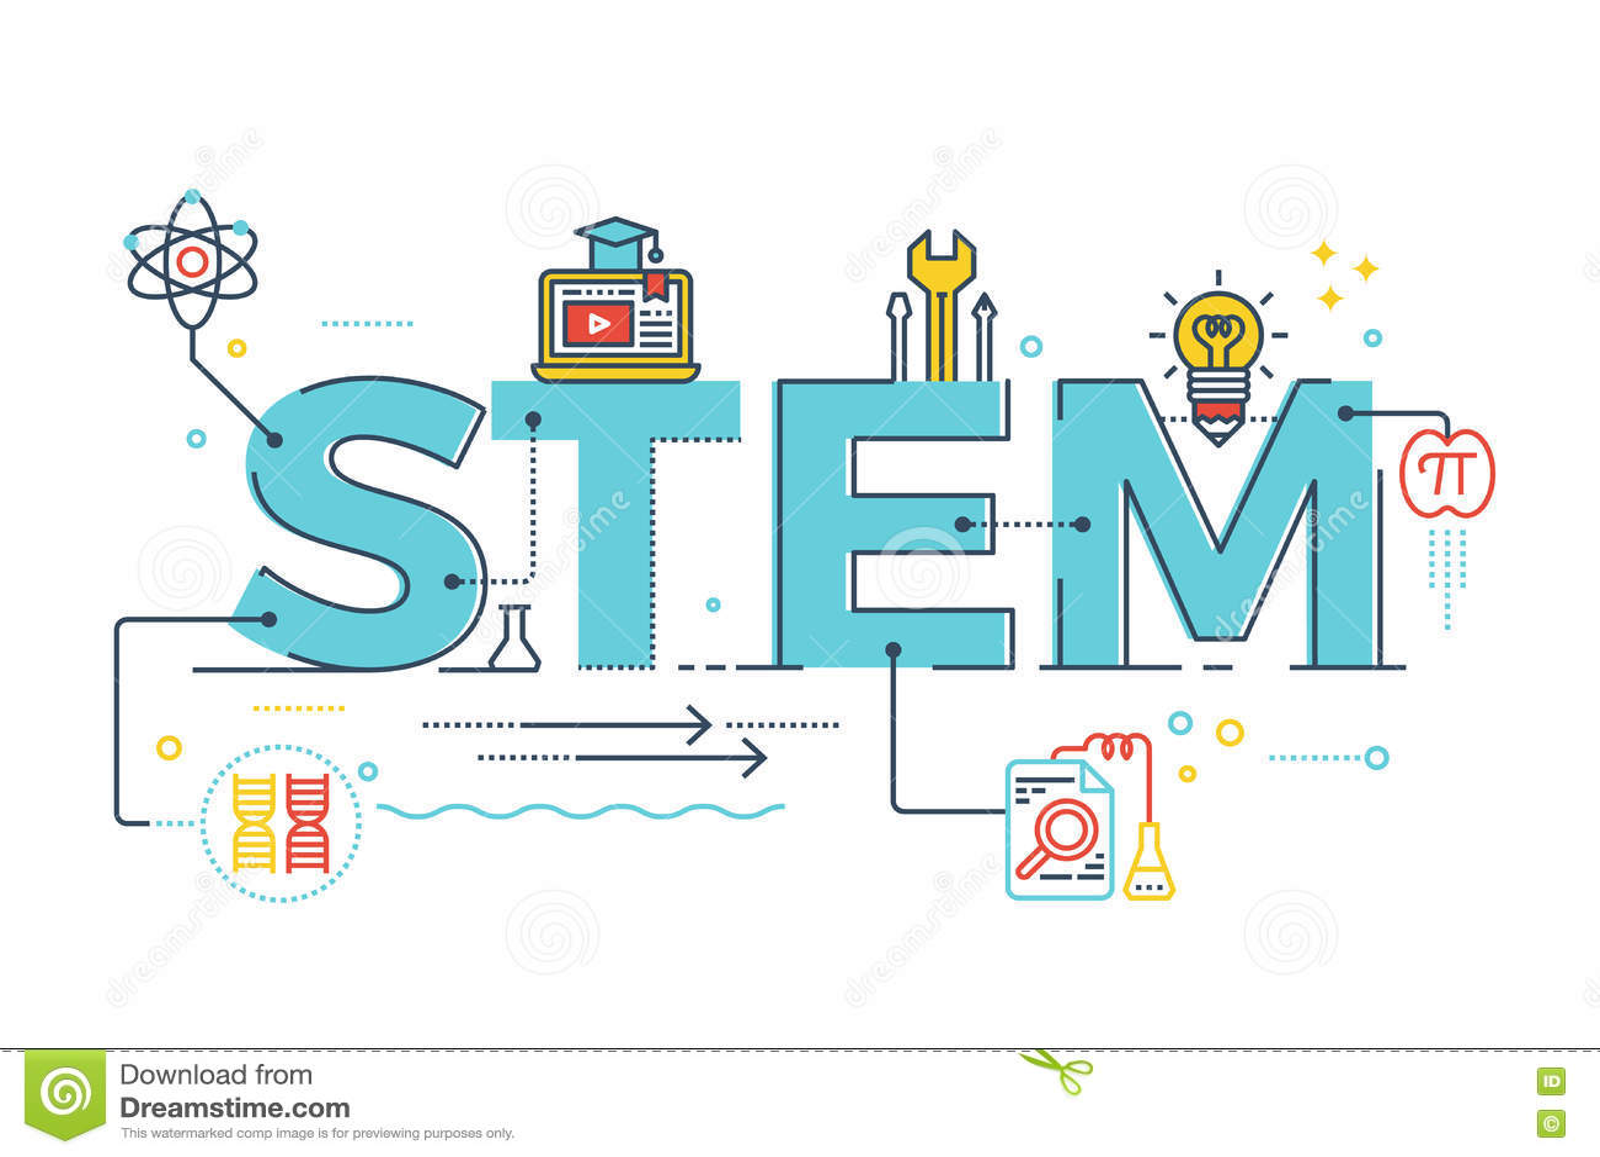 stem science technology engineering mathematics stock vector illustration of science